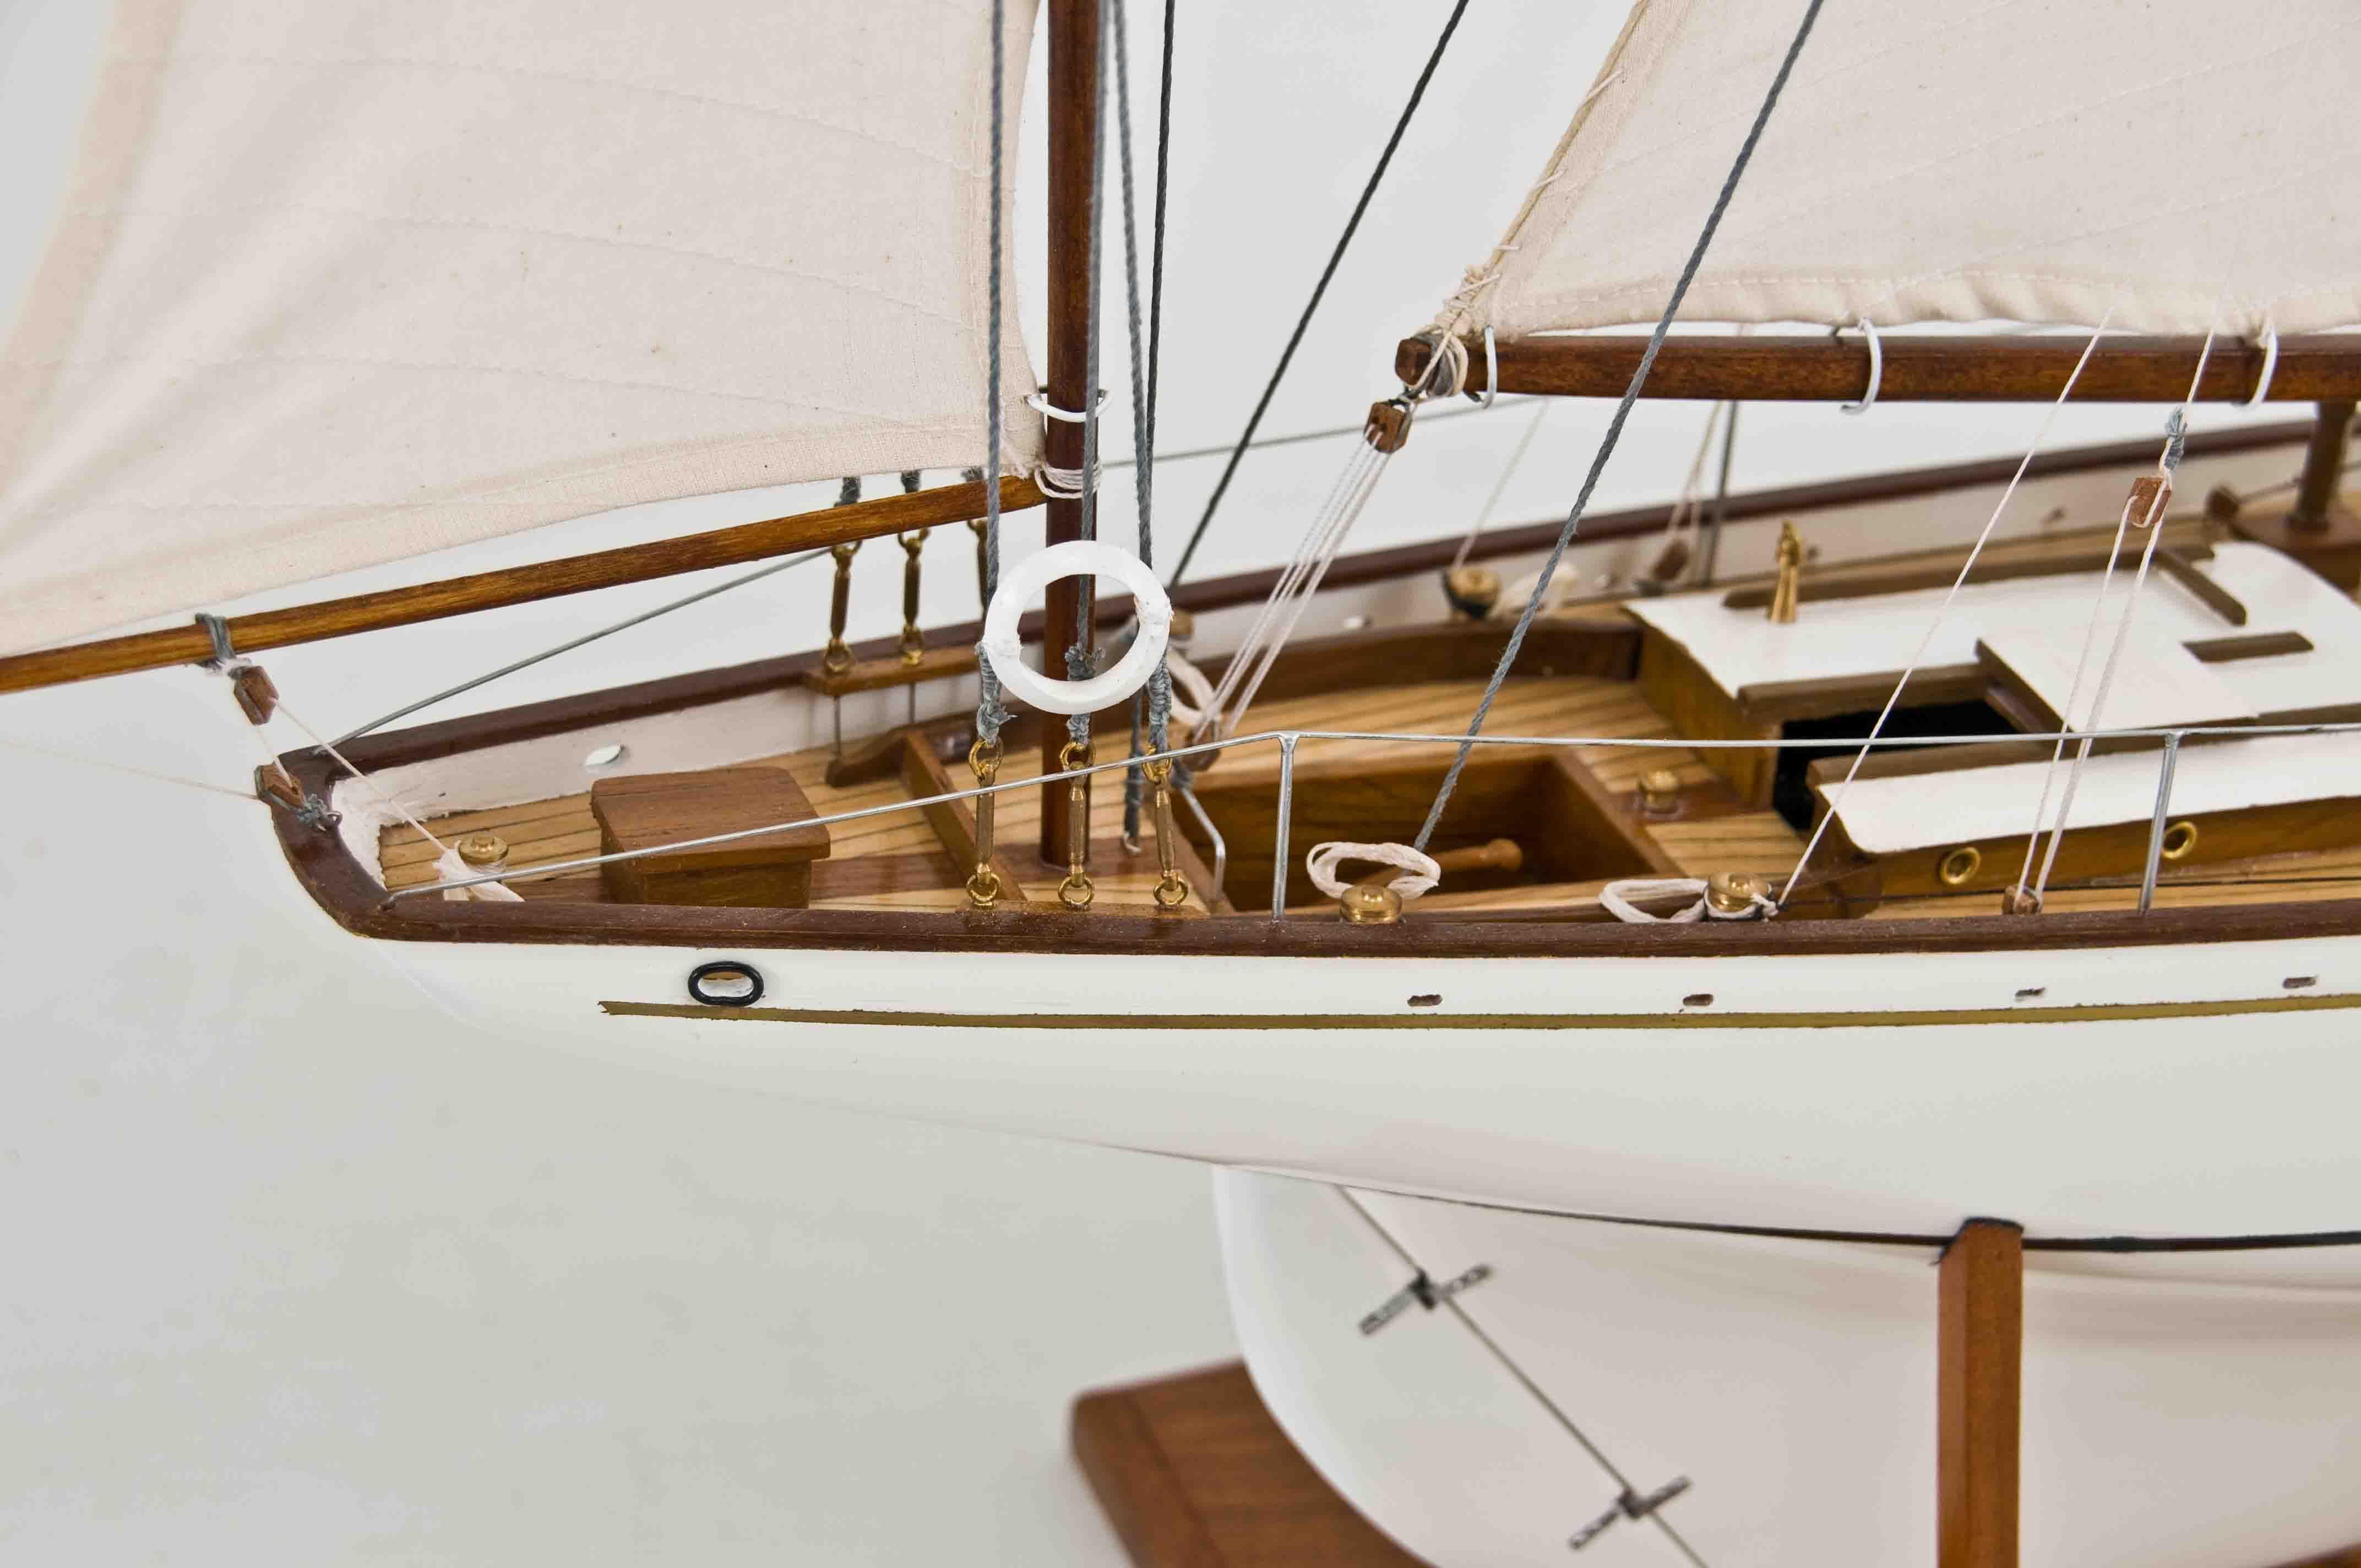 Dorade modèle de yacht (Gamme Supérieure)